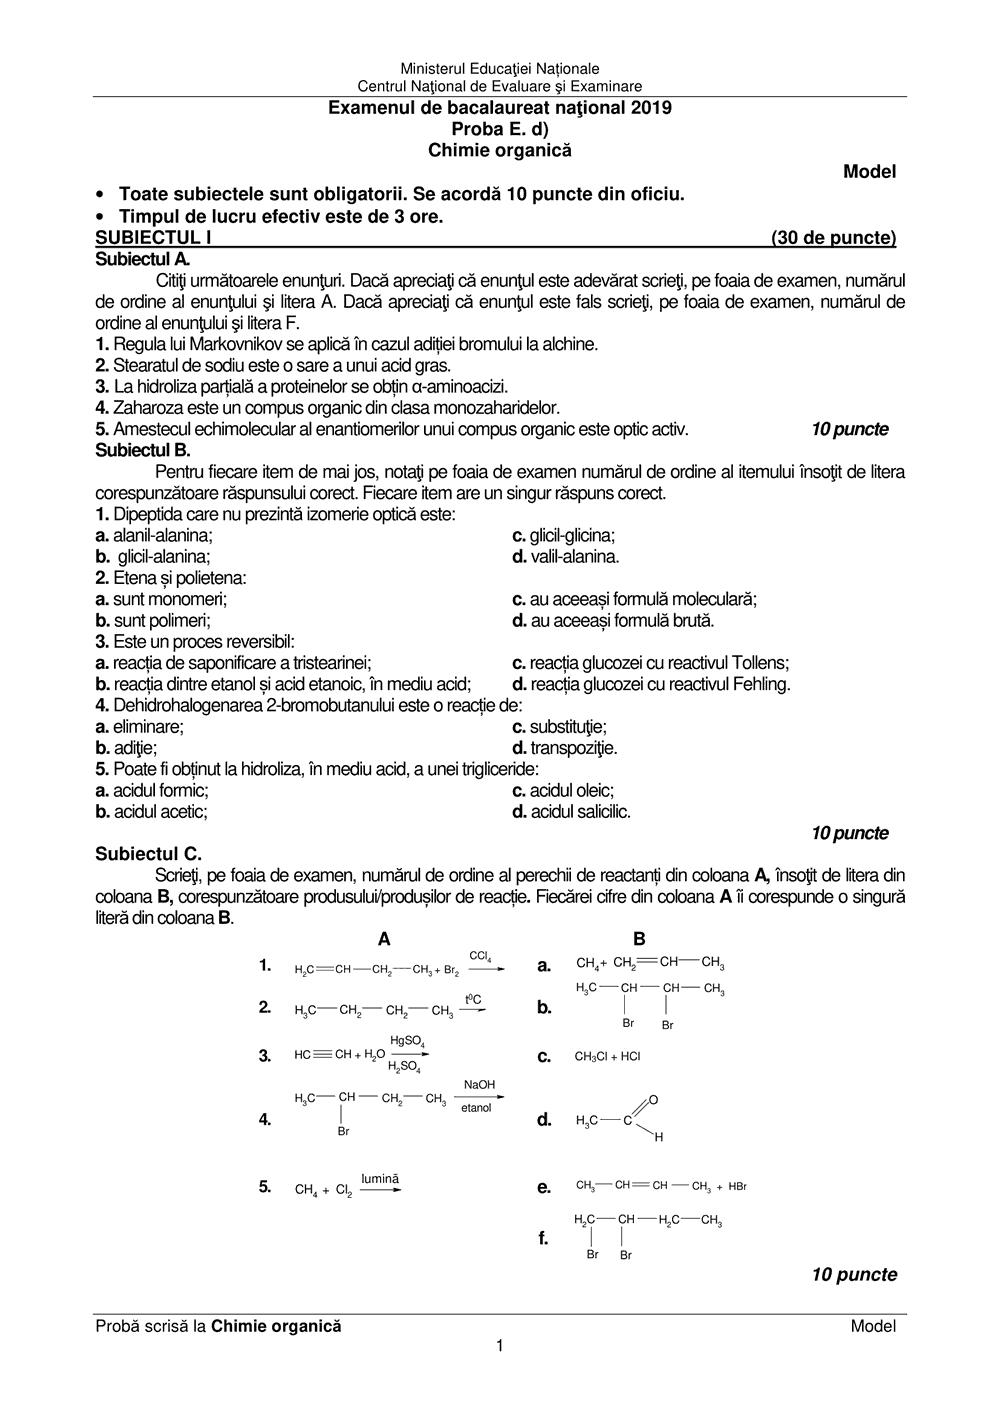 model de subiect chimie organica Bacalaureat 2019